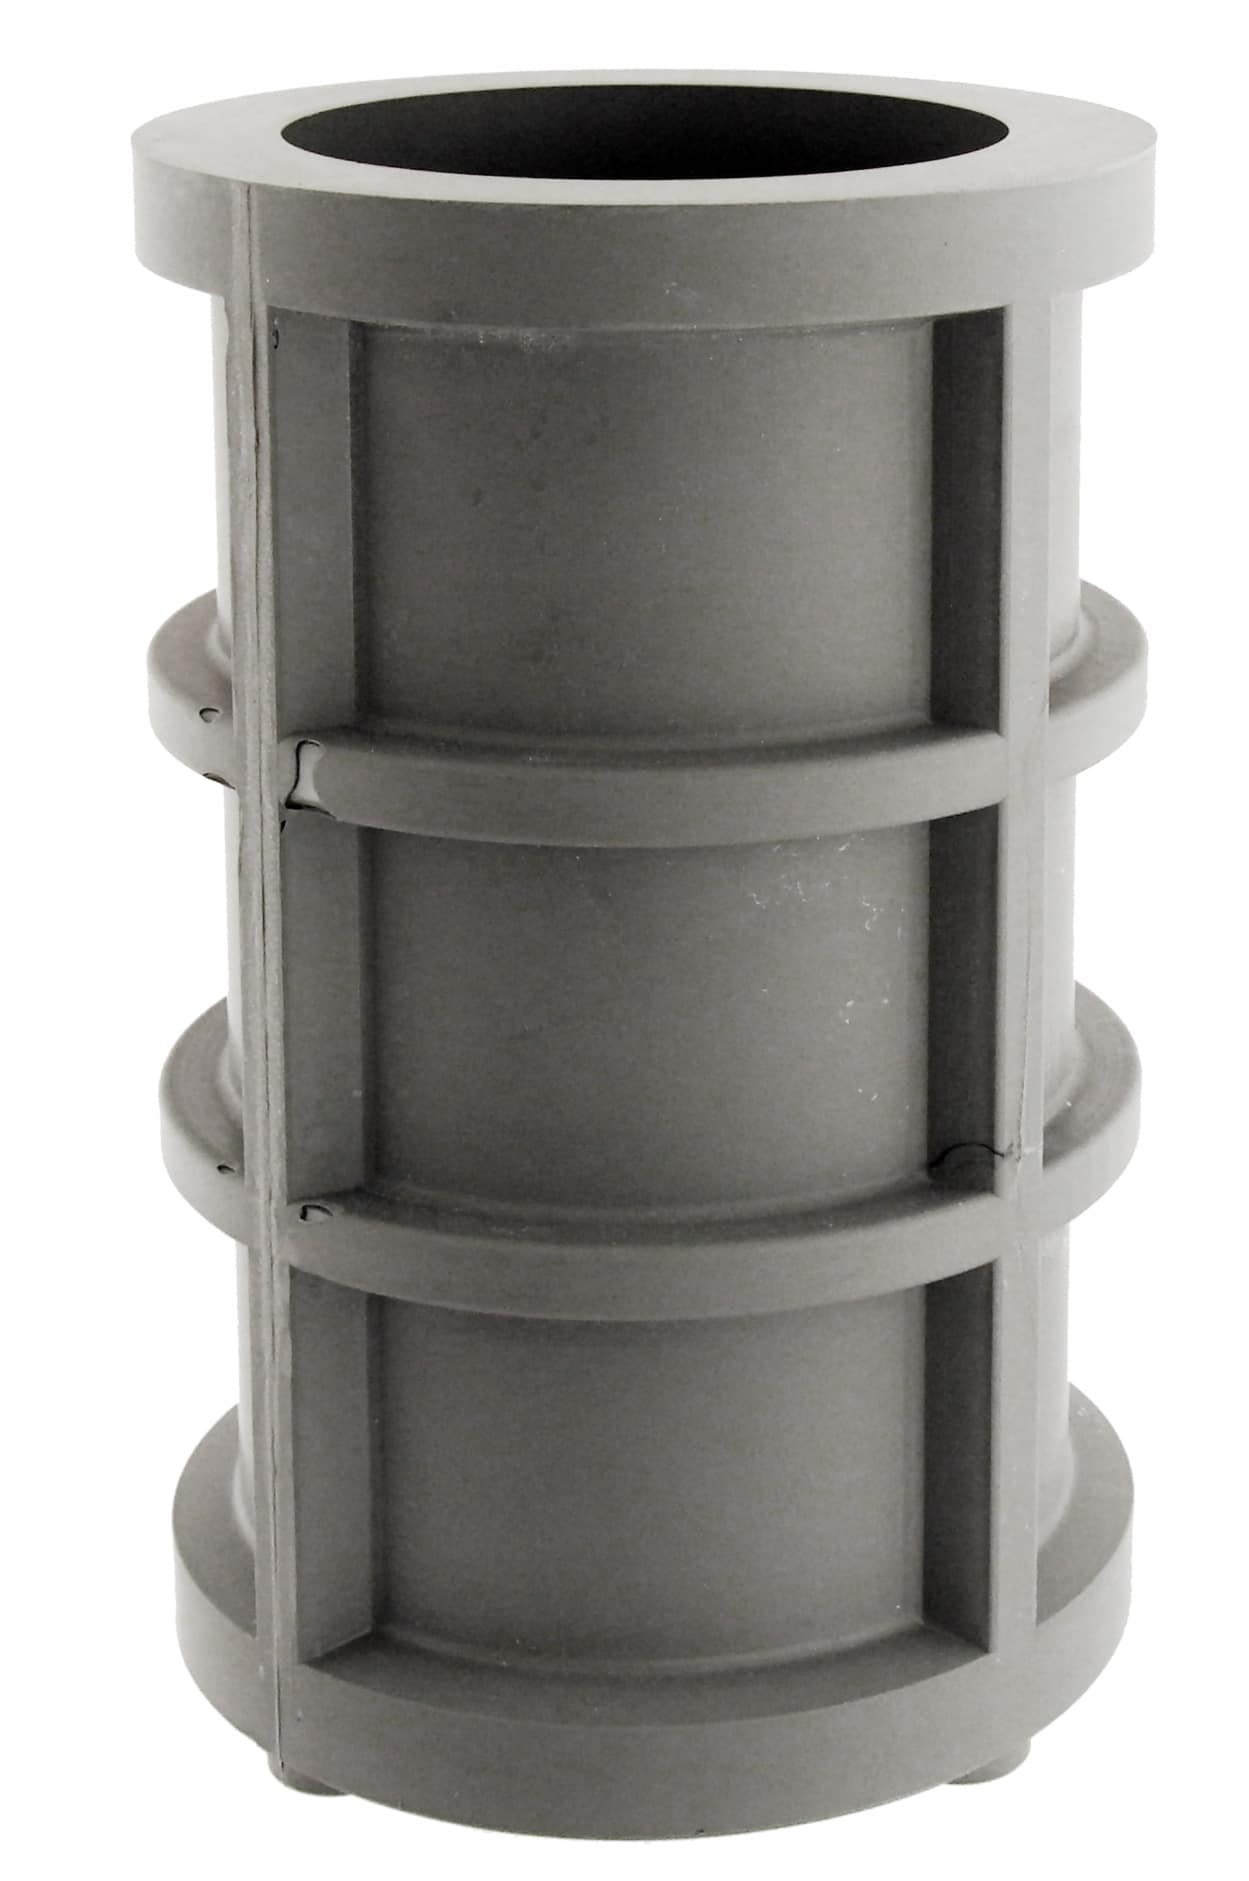 cubiera-cilindrica-1632